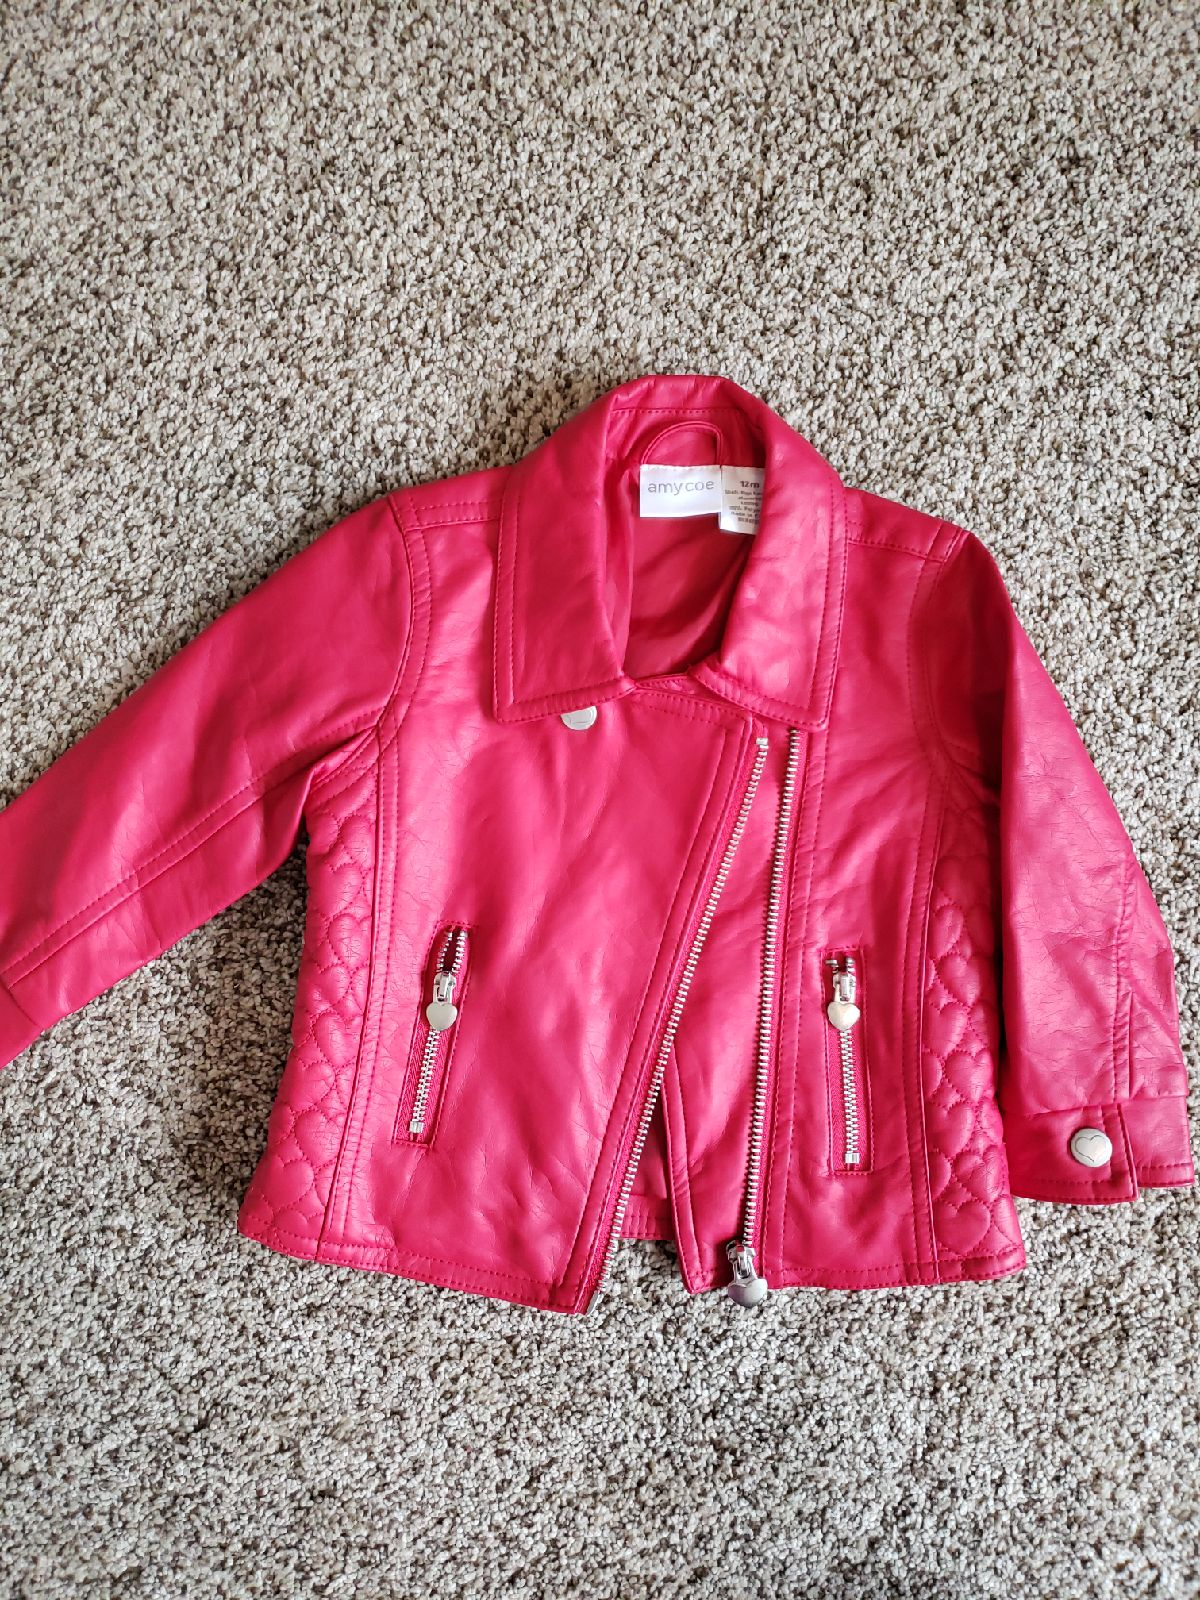 12 Mo Faux Leather Jacket